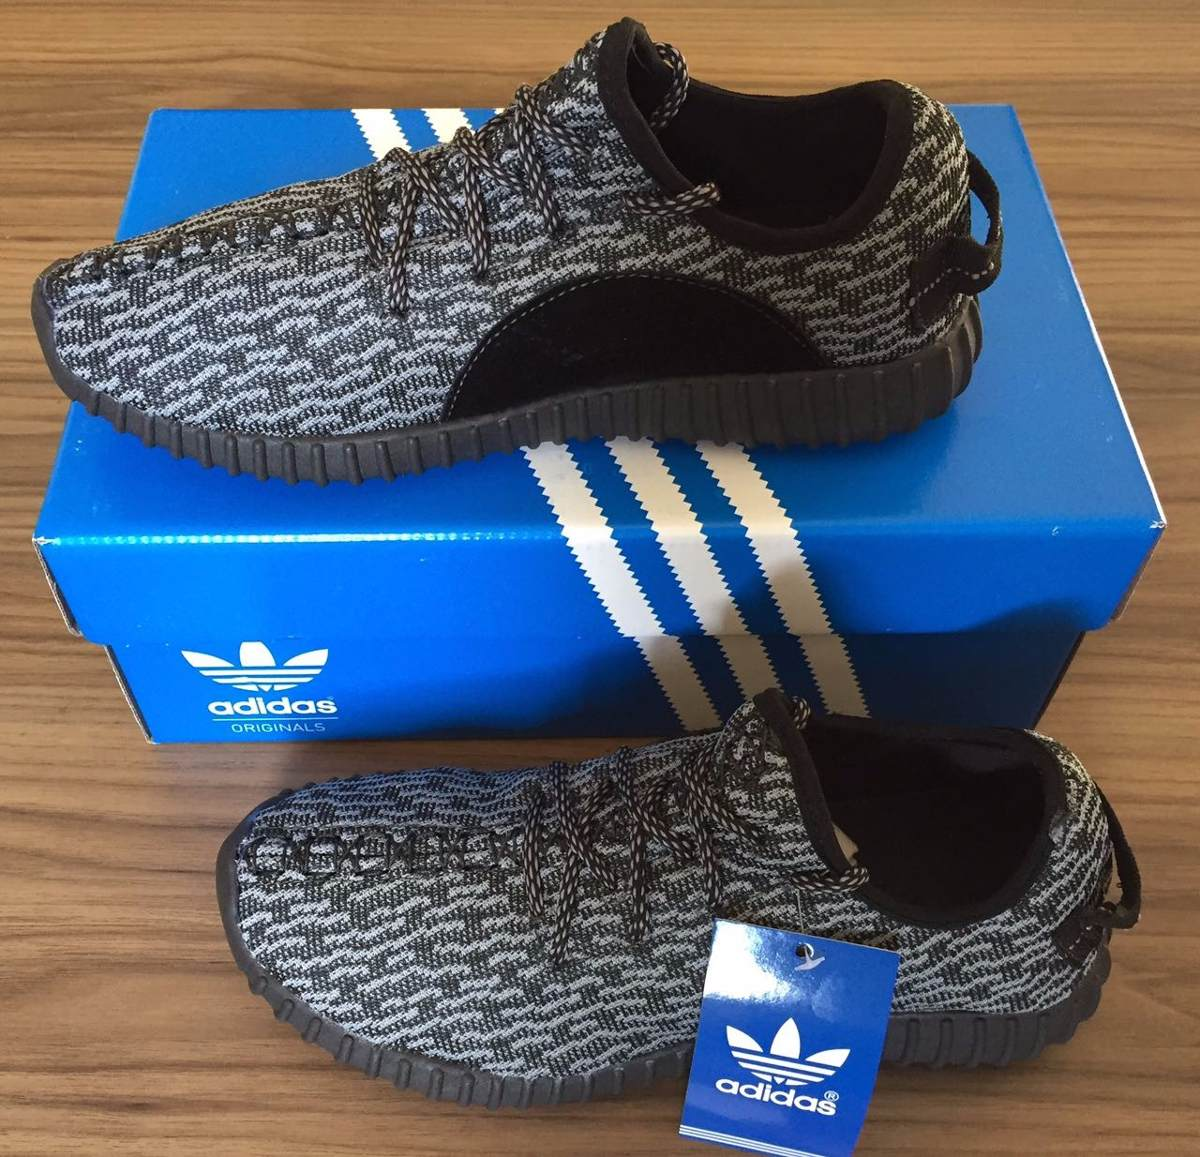 4988af9c2eccf ... wholesale tênis adidas yeezy boost 350 kanye west frete grátis caixa. carregando  zoom. 1b0a2